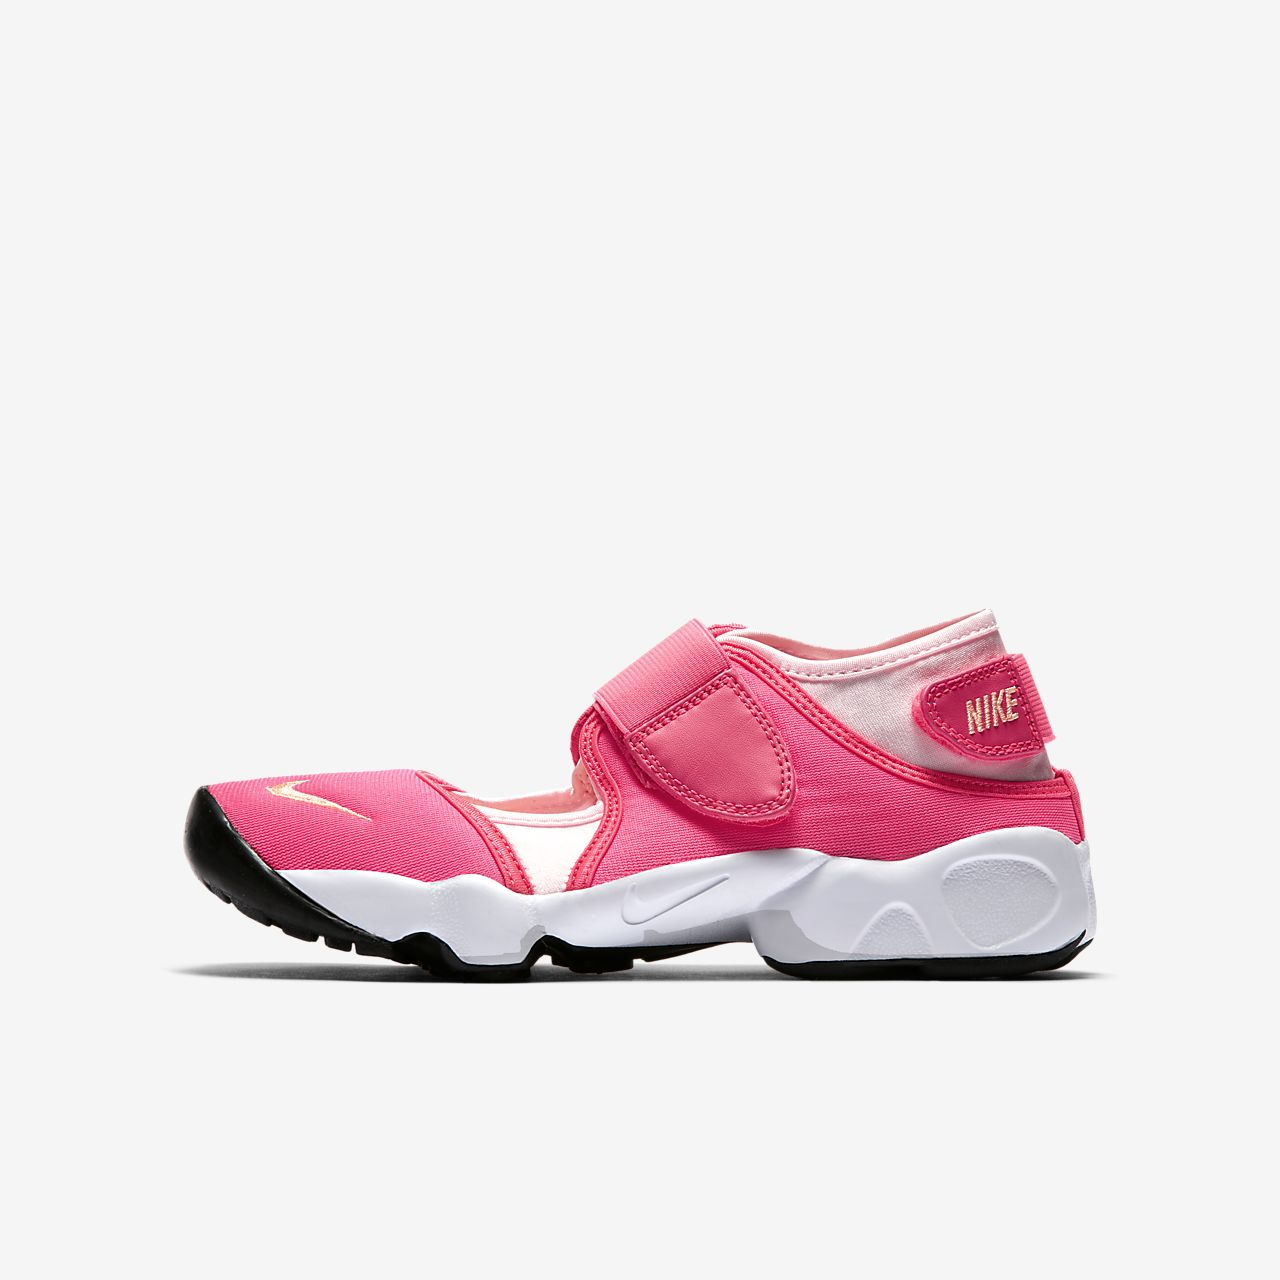 sale retailer 250fd ad9ac ... Sko Nike Rift för barn ungdom